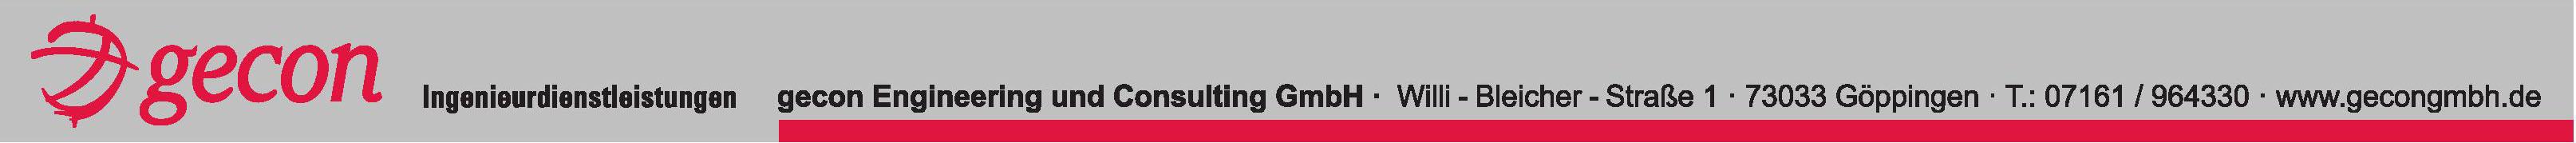 gecon Engineering und Consulting GmbH